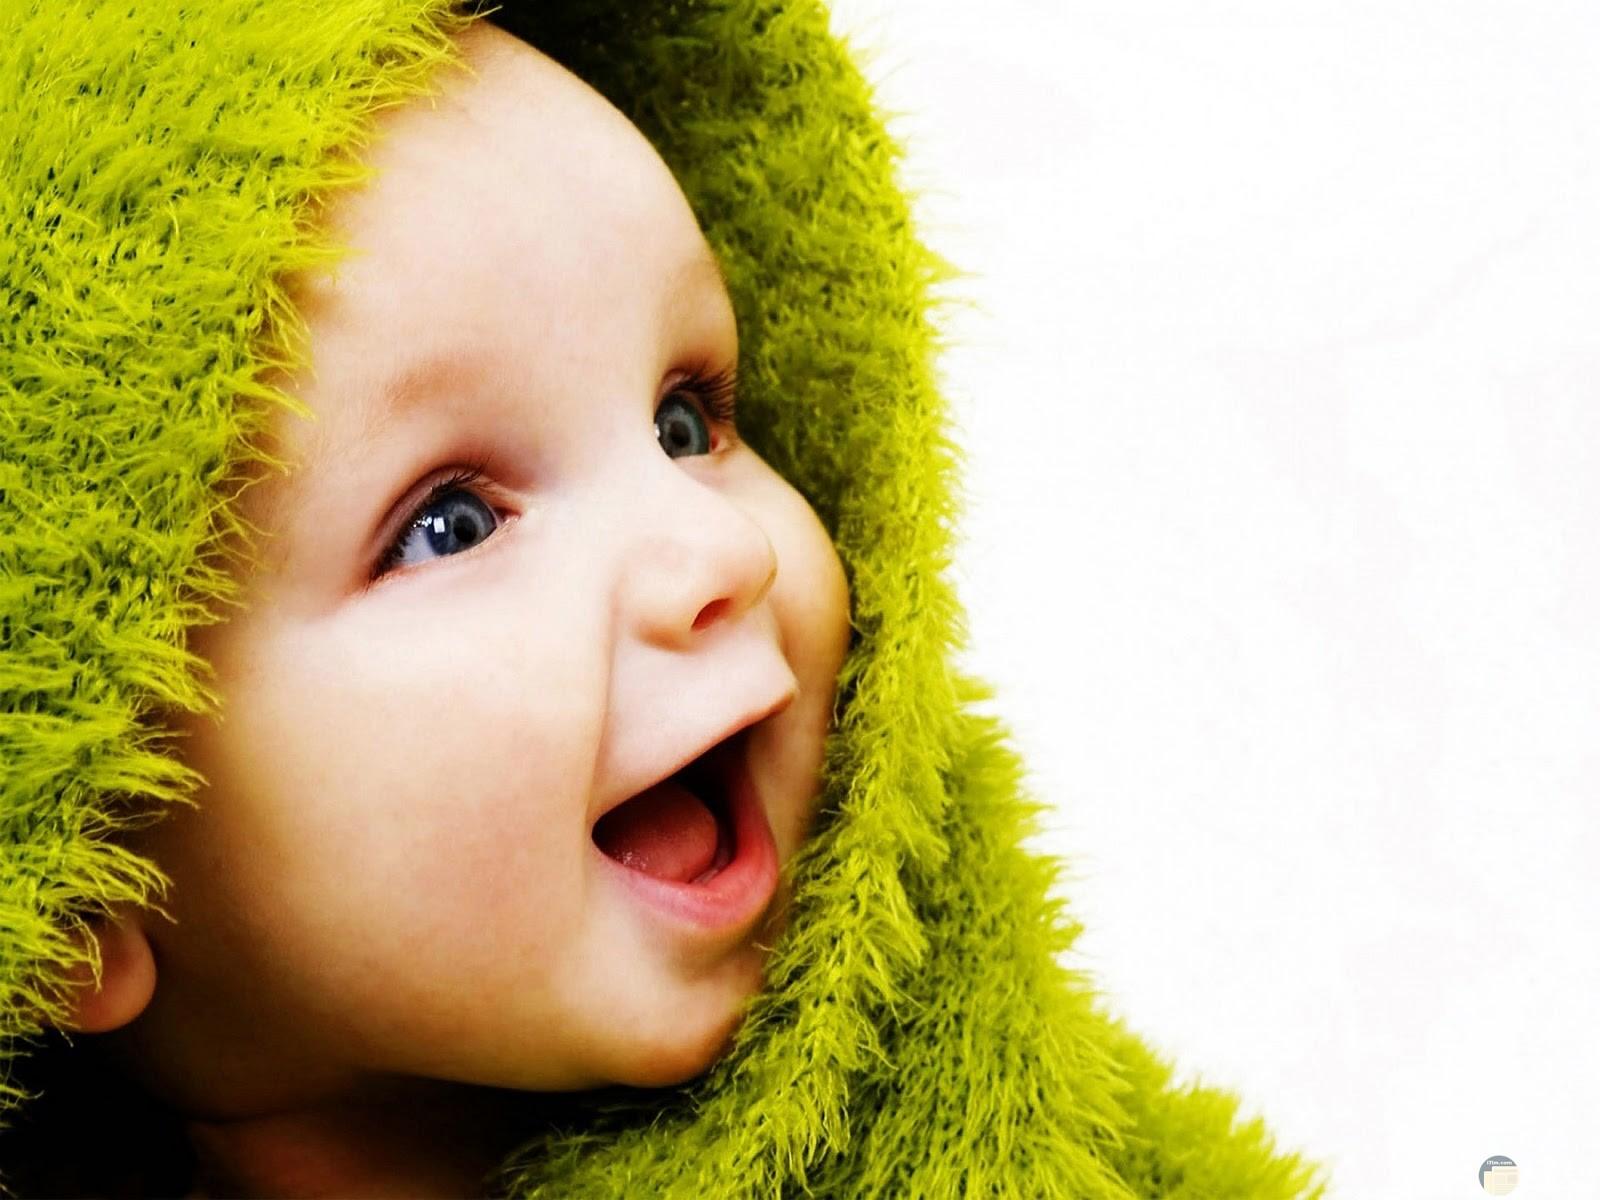 ابتسامة طفل و مداعبته.